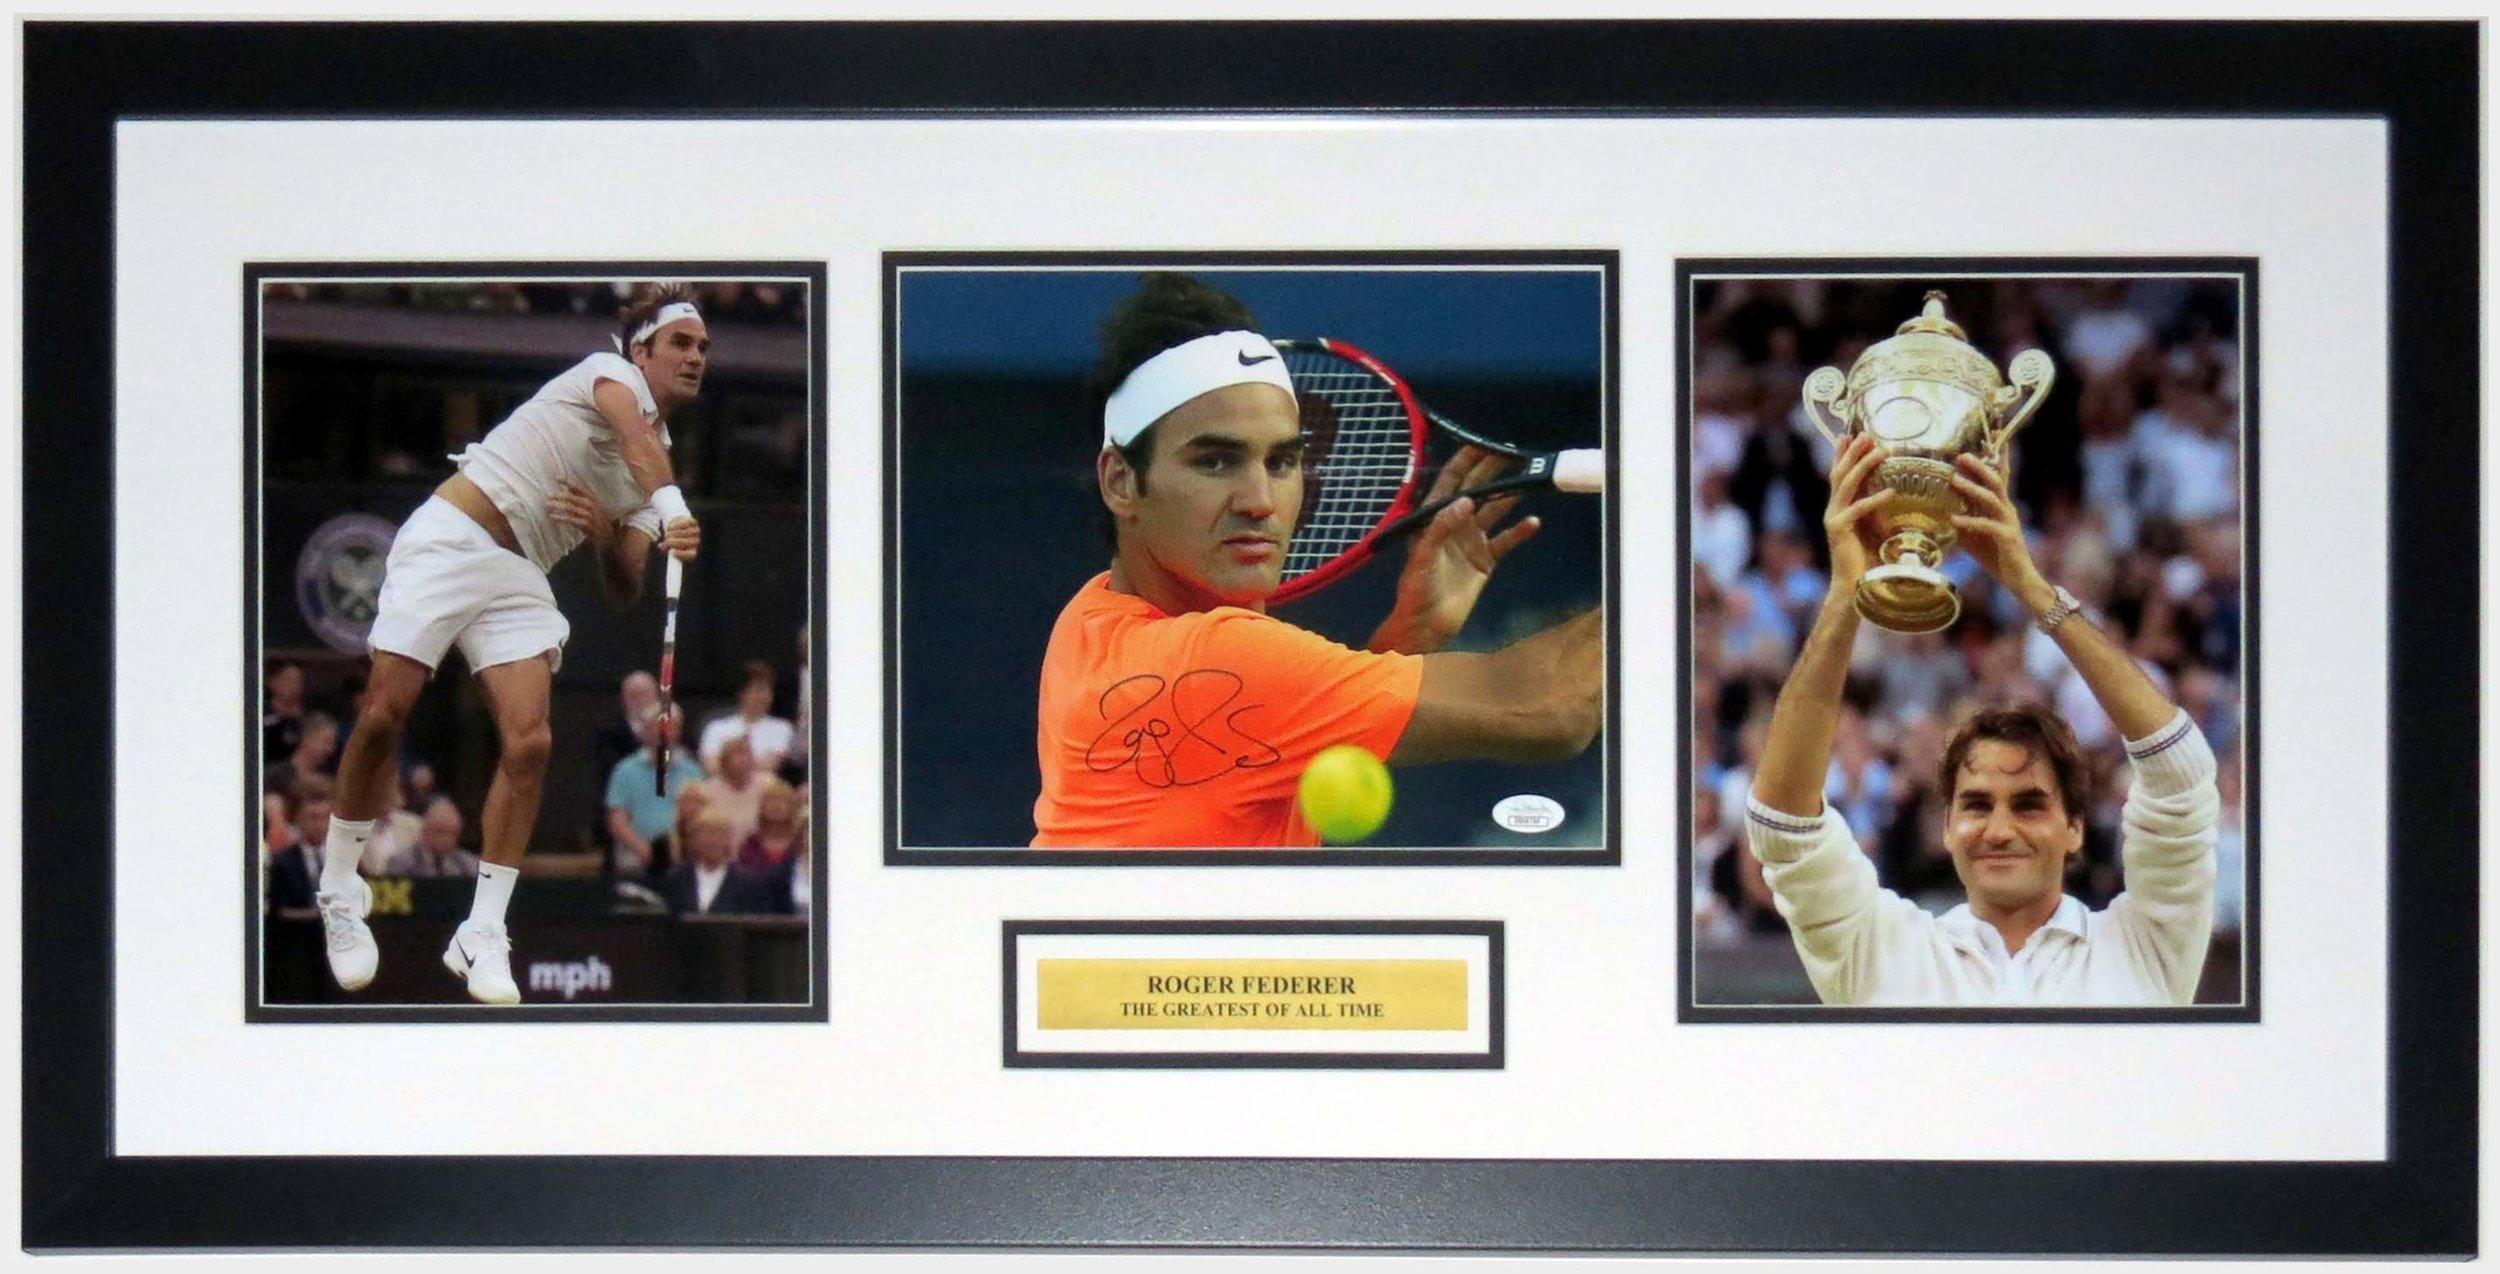 Roger Federer Signed Wimbledon Championship 8x10 Photo - JSA COA Authenticated - Professionally Framed & Plate